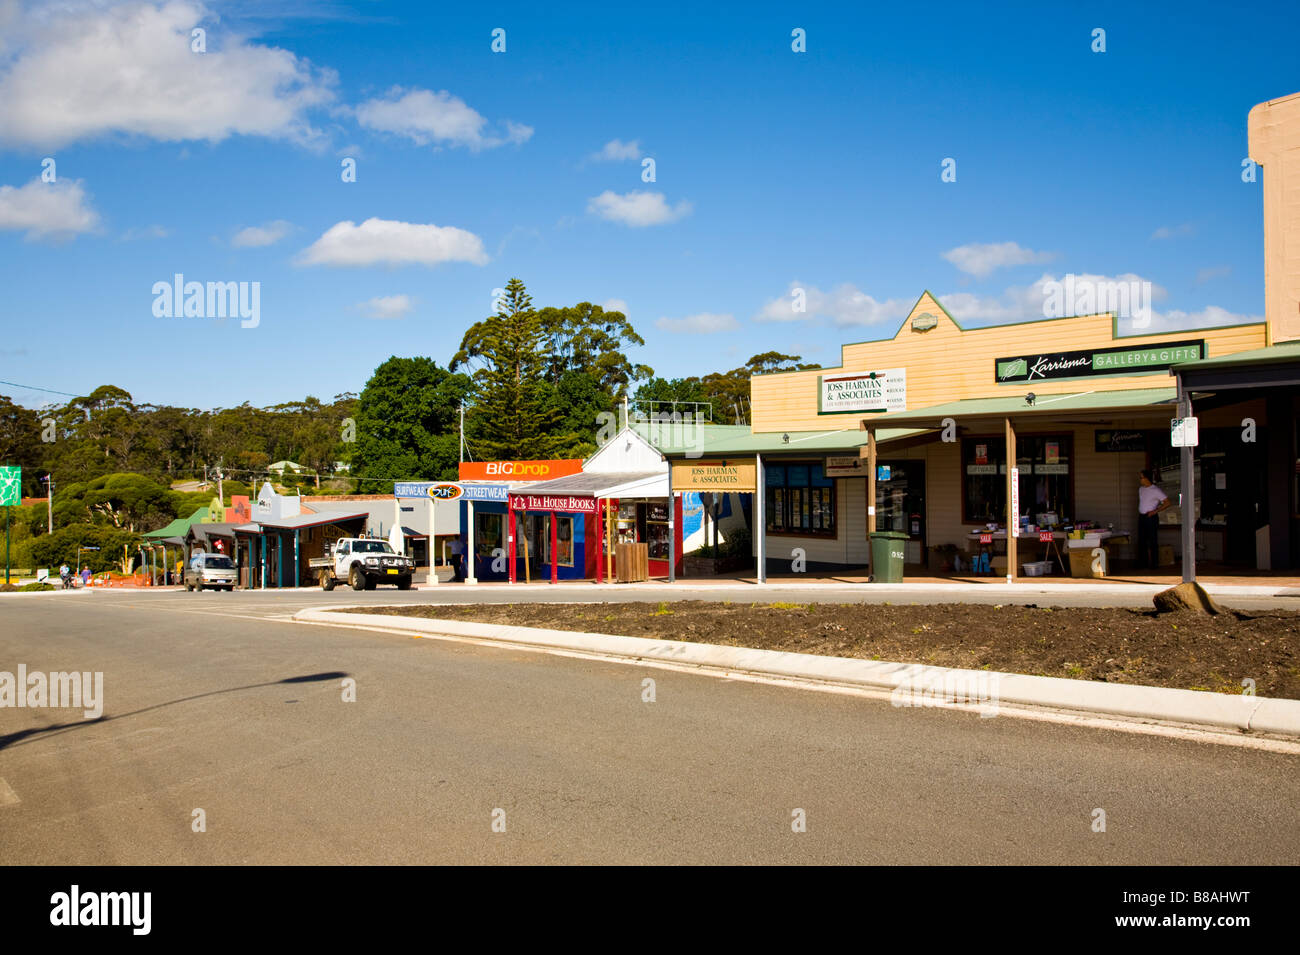 Street Scene Denmark Western Australia wa Stock Photo